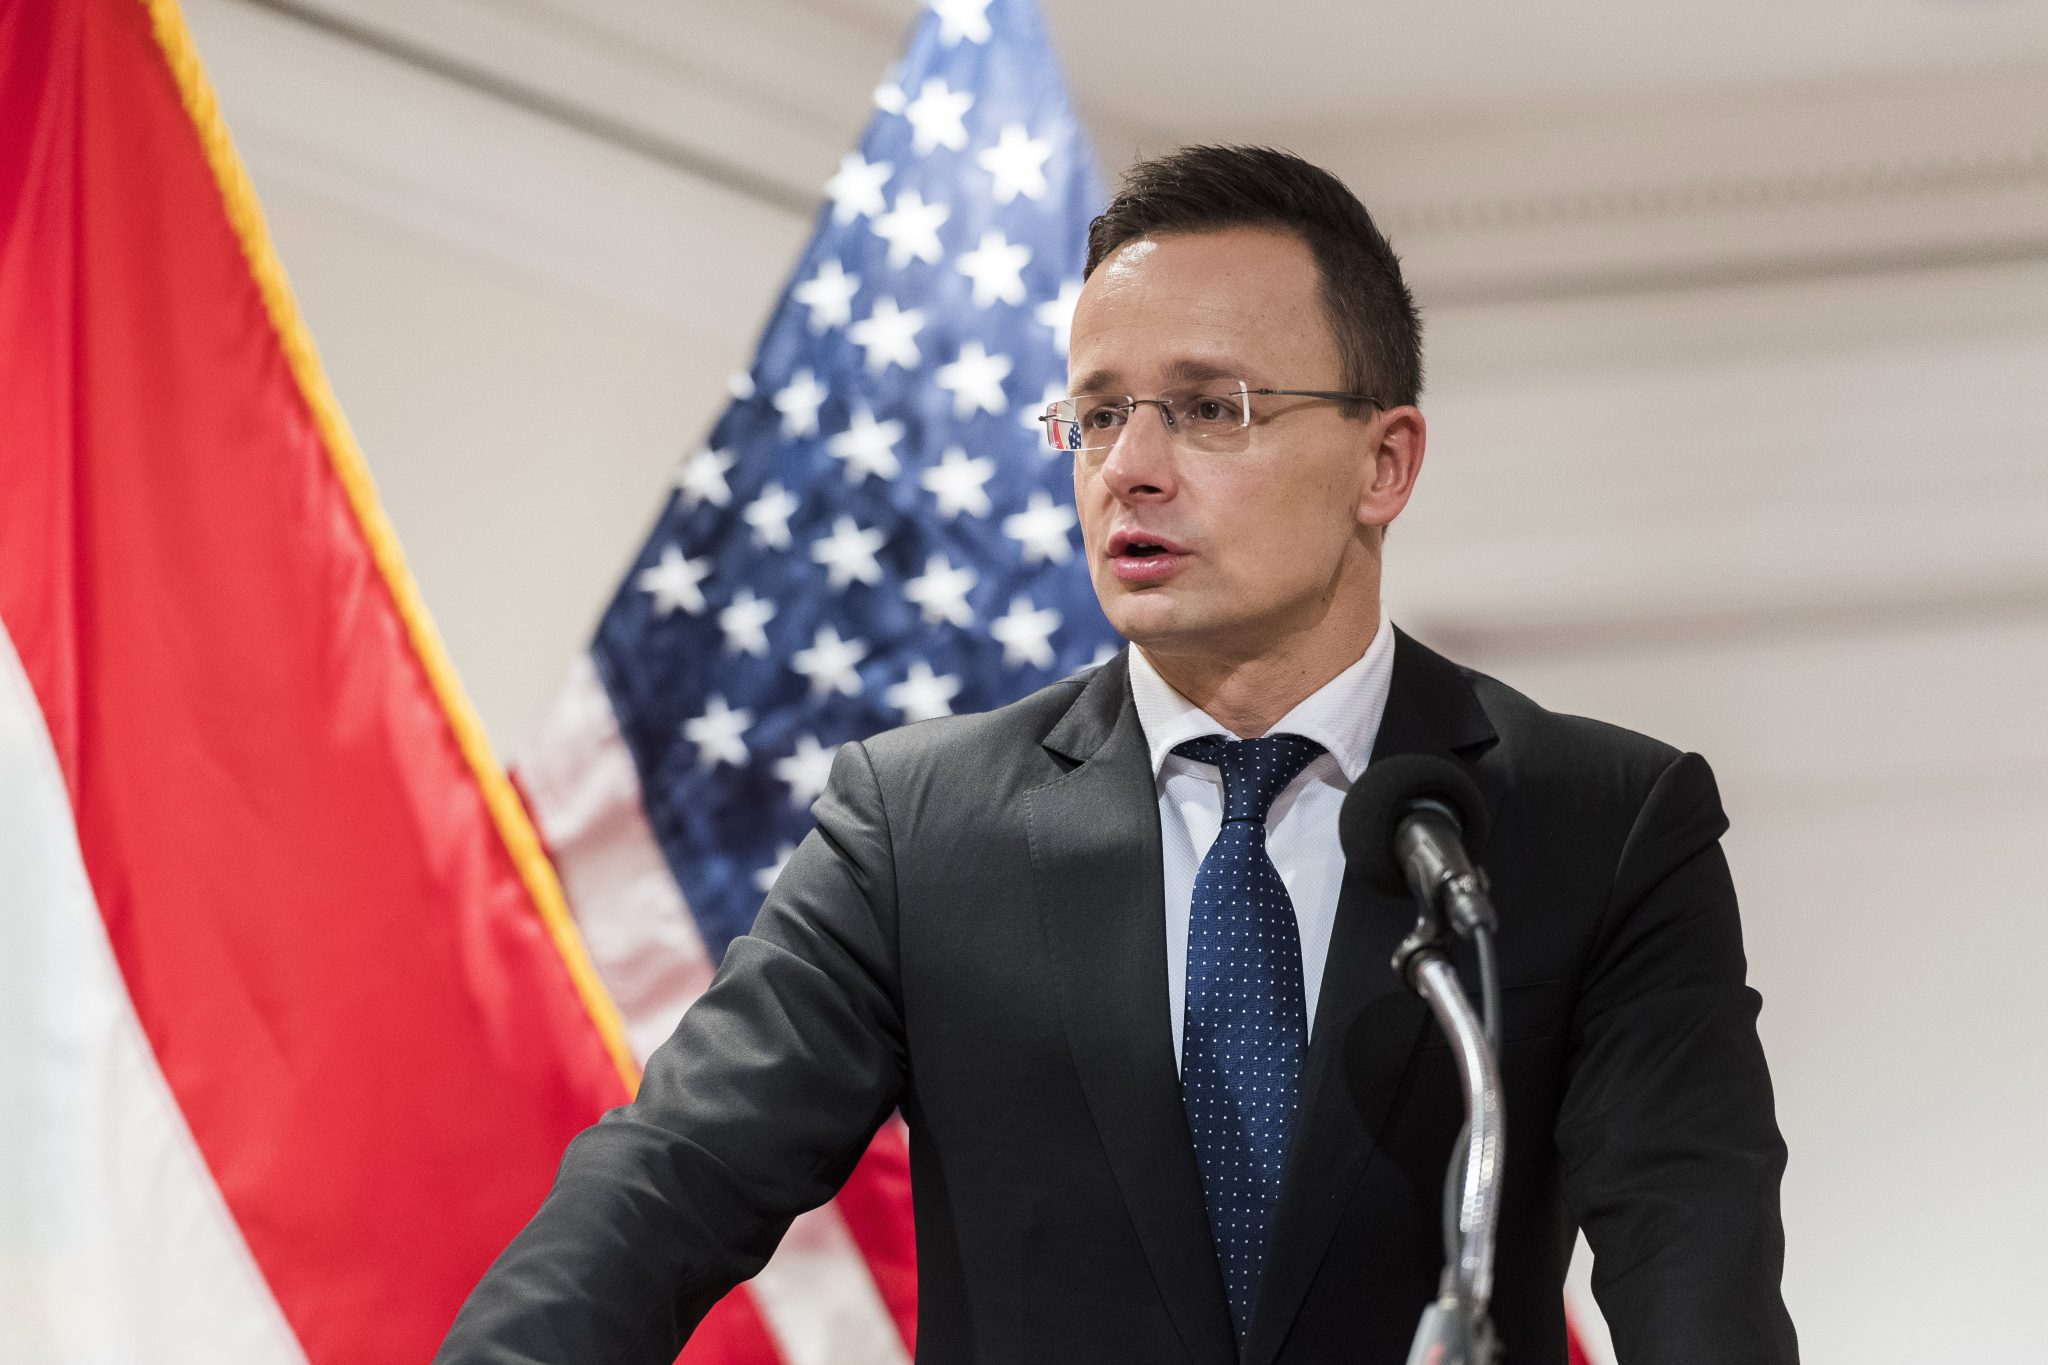 FM Szijjártó: Biden Criticizing State of Democracy in Hungary Insult to Hungarians